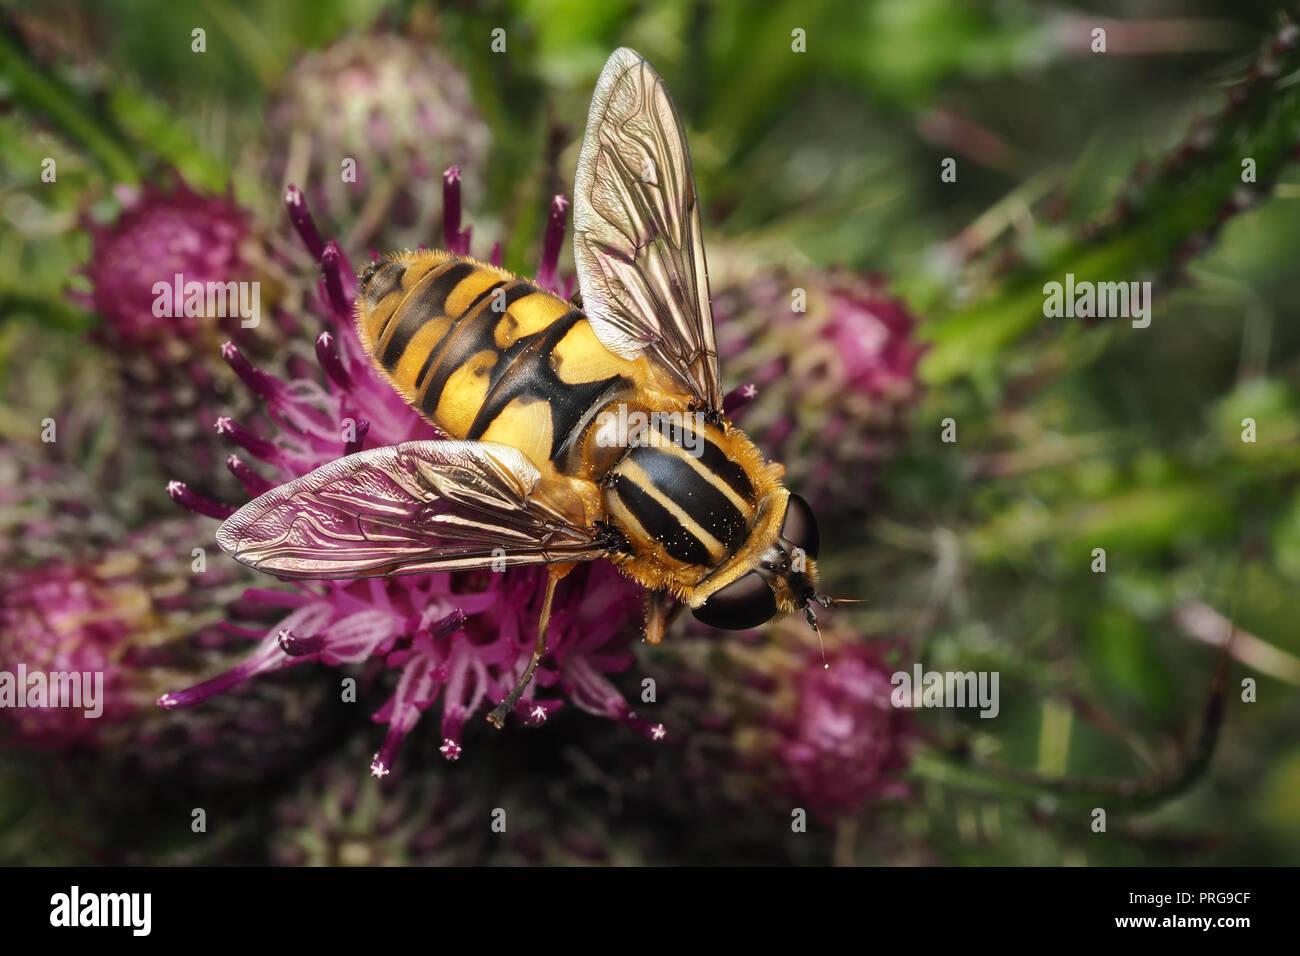 Helophilus pendulus Hoverfly feeding on thistle. Tipperary, Ireland - Stock Image